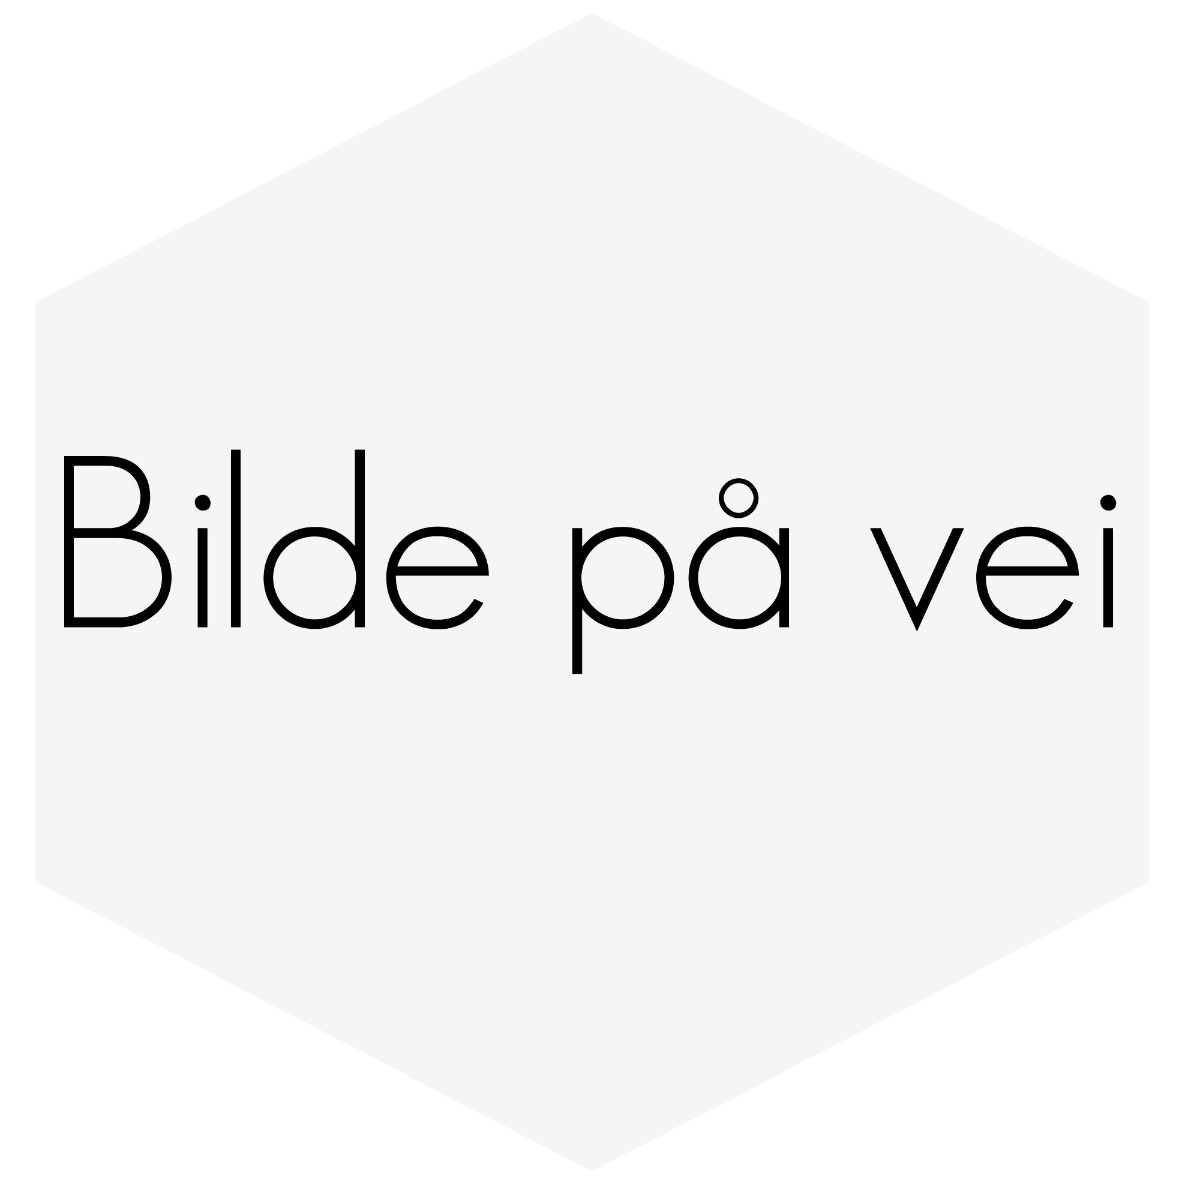 VANNPUMPE DIESELVARMER BLA VOLVO V70 ,S60 MFL,SJEKK NR